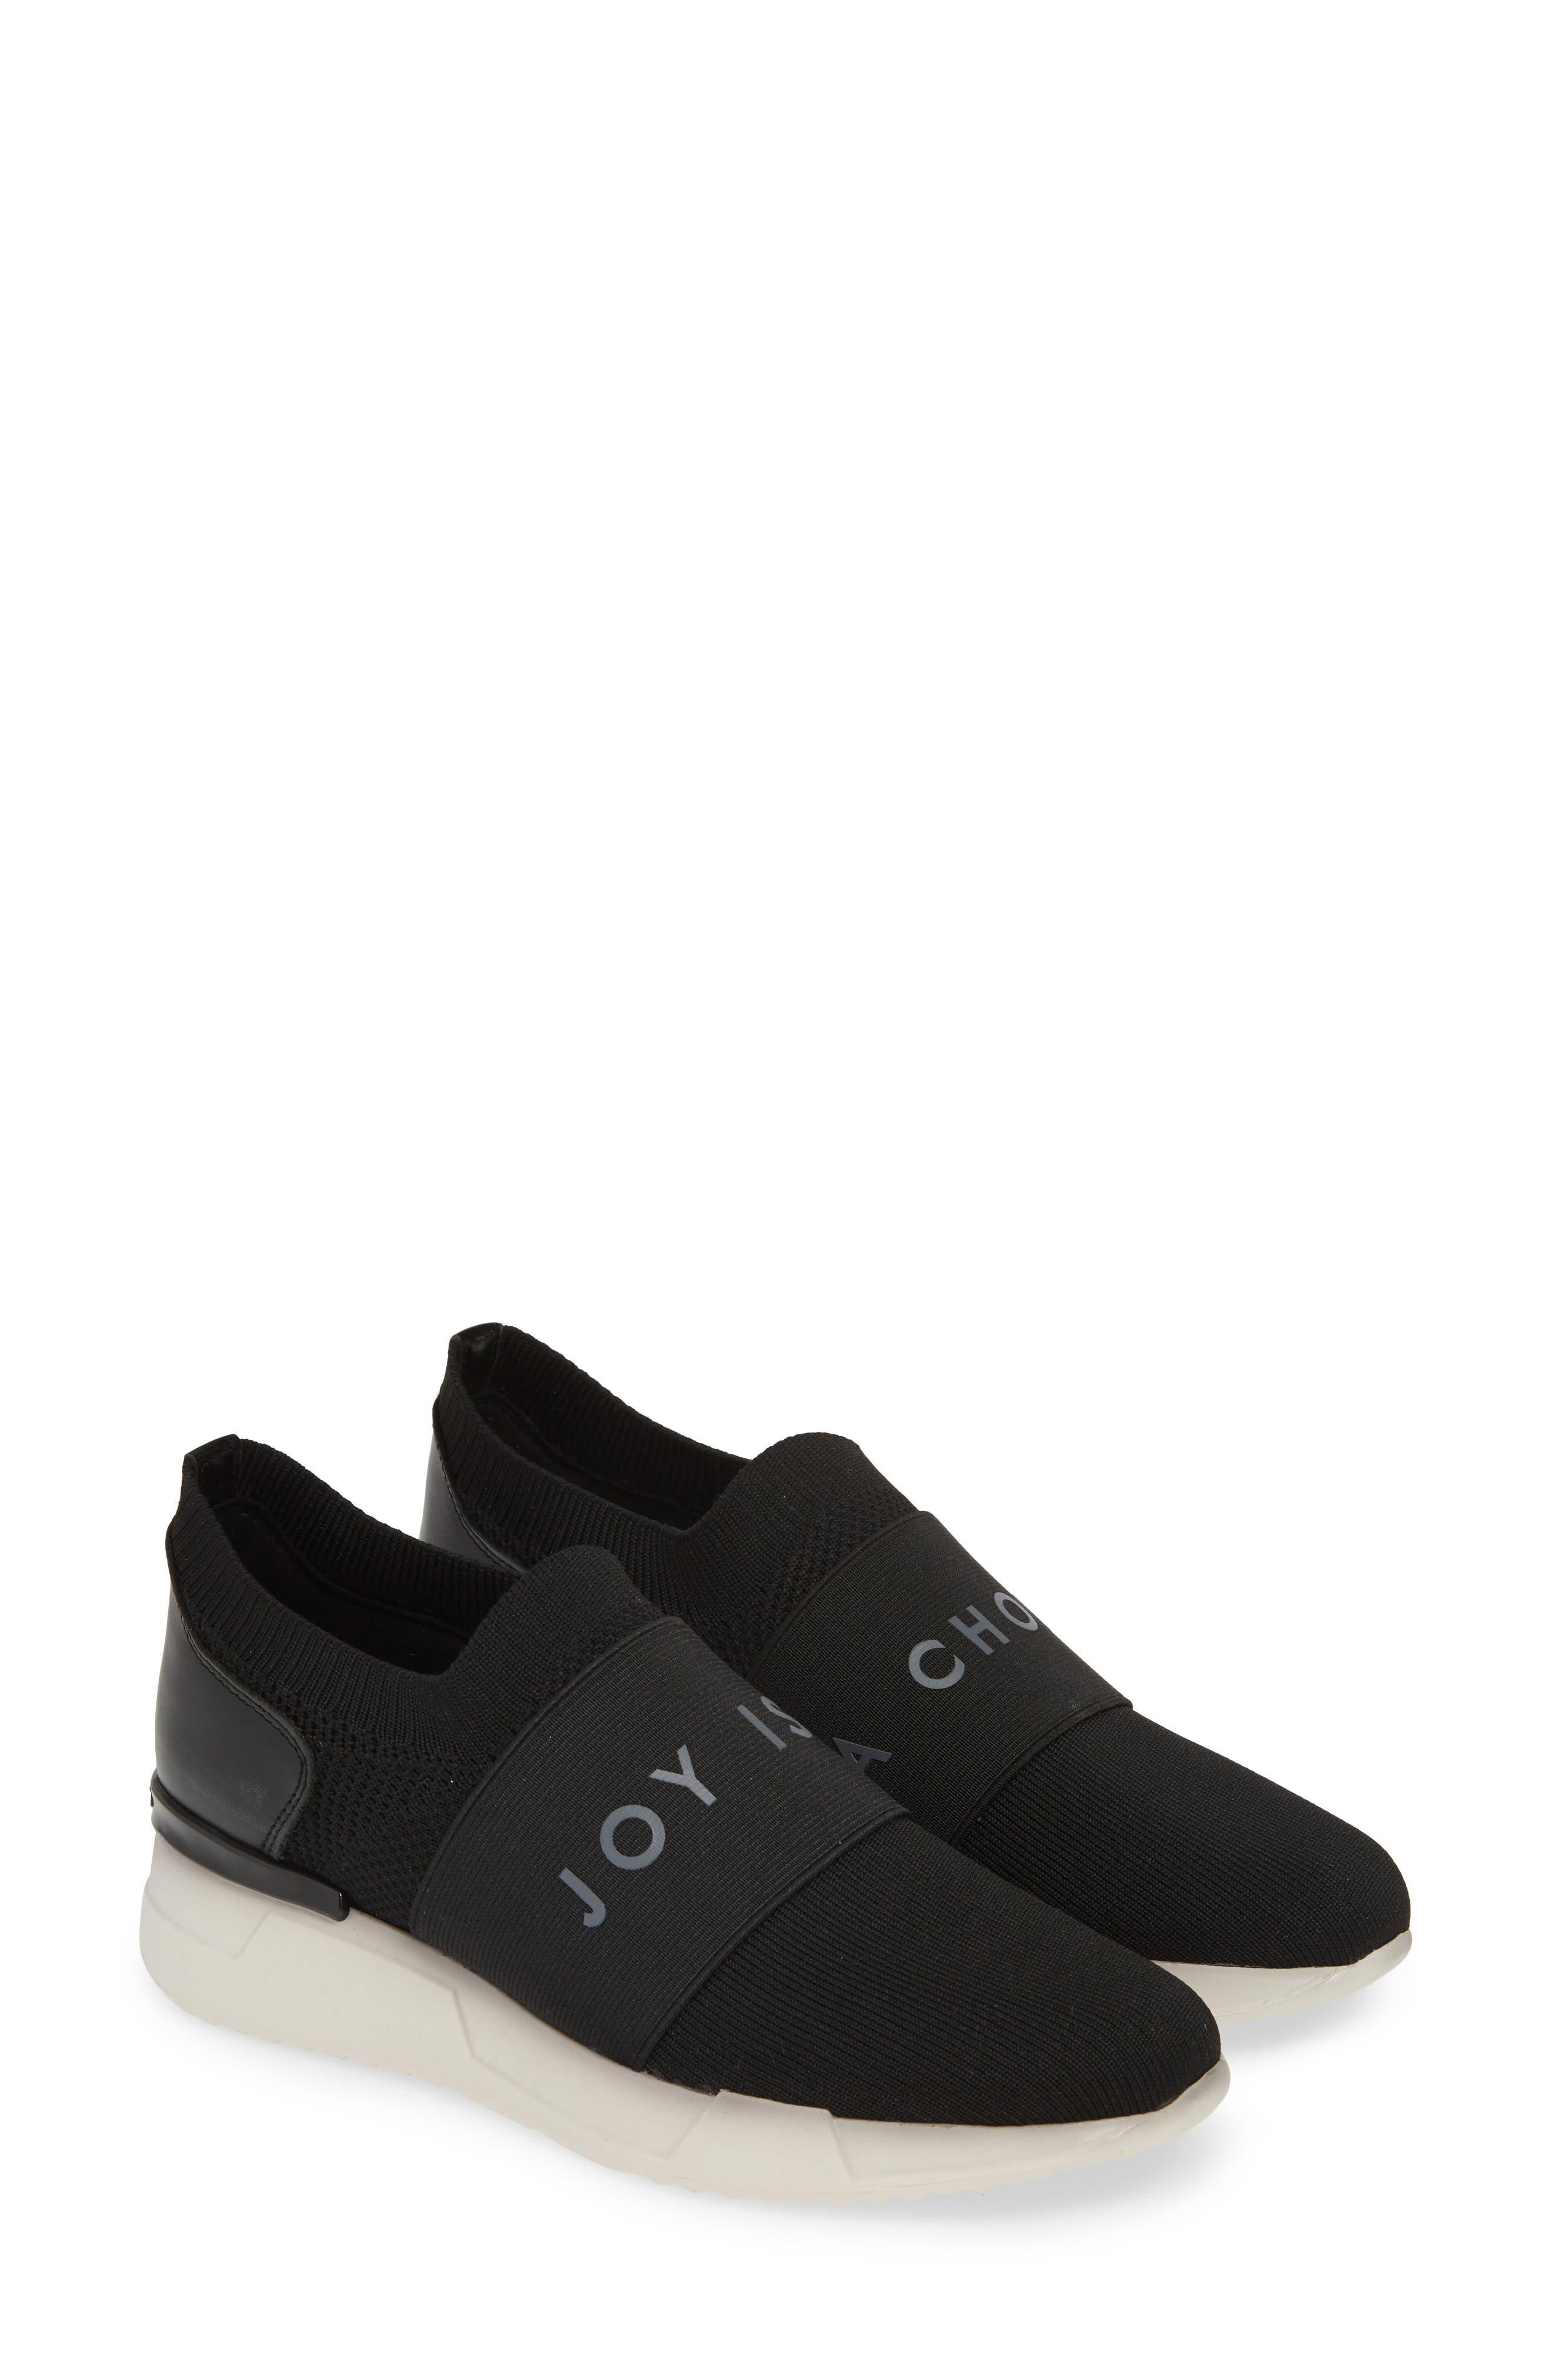 HISPANITAS, Spence Joy Is Choice Sock-Knit Sneaker, Alternate thumbnail 2, color, BLACK/ WHITE FABRIC